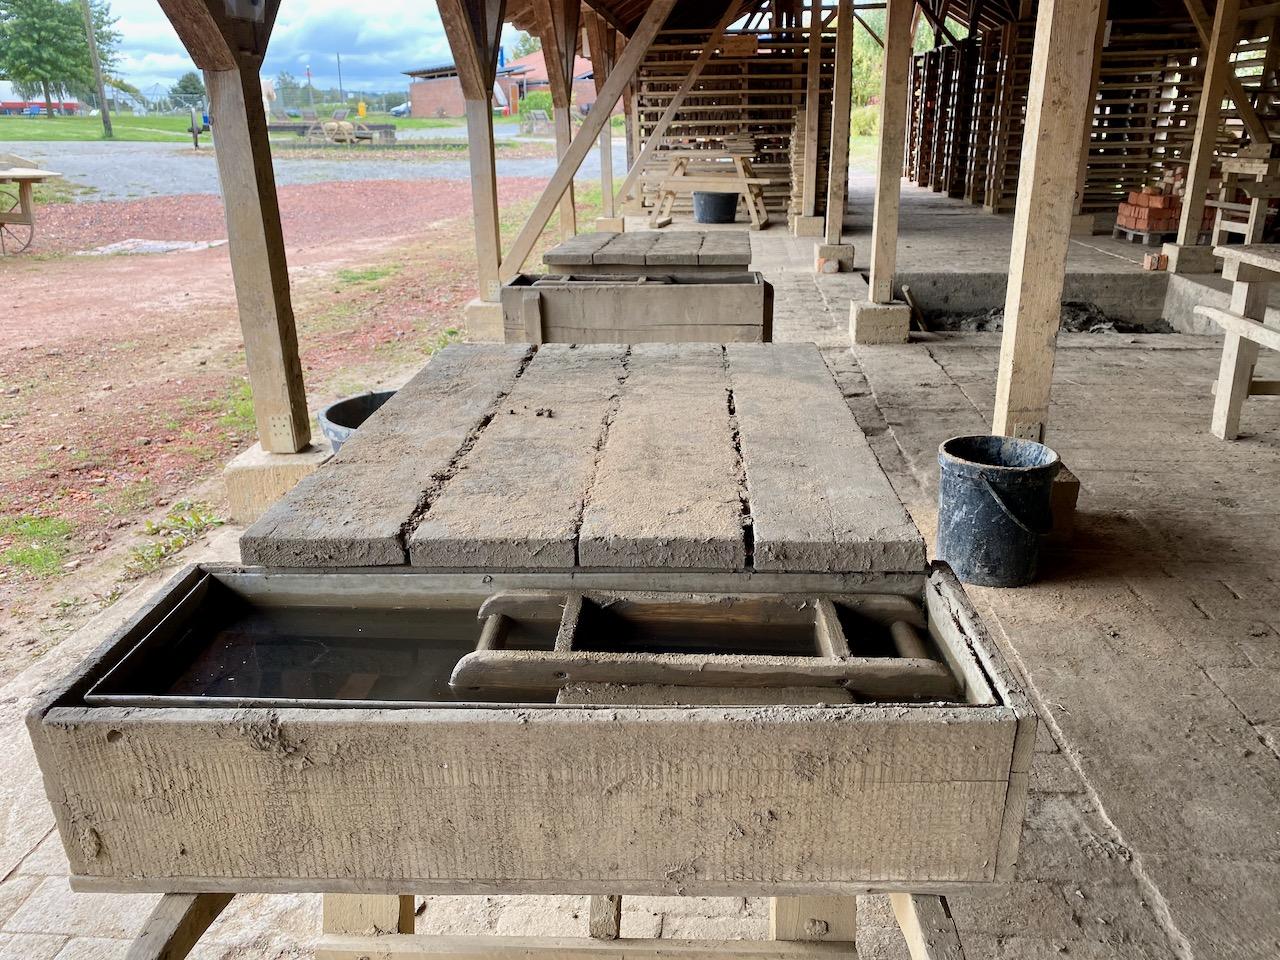 Lehmgrube Ziegeleimuseum Lage